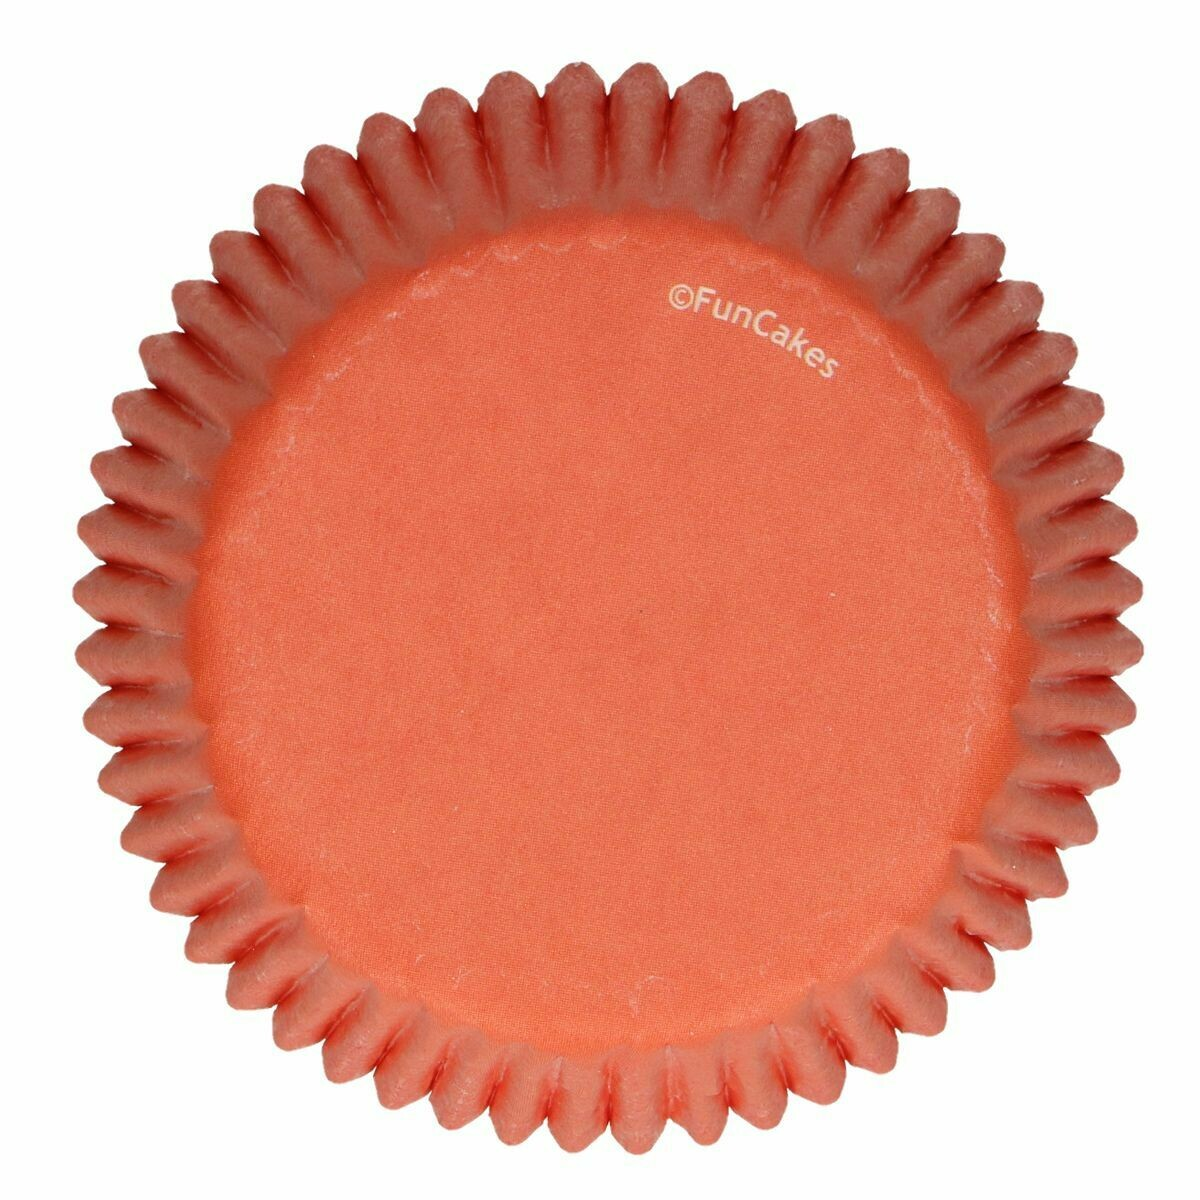 SALE!!! FunCakes Cupcake Cases -ORANGE -Θήκες Ψησίματος Πορτοκαλί 48 τεμ